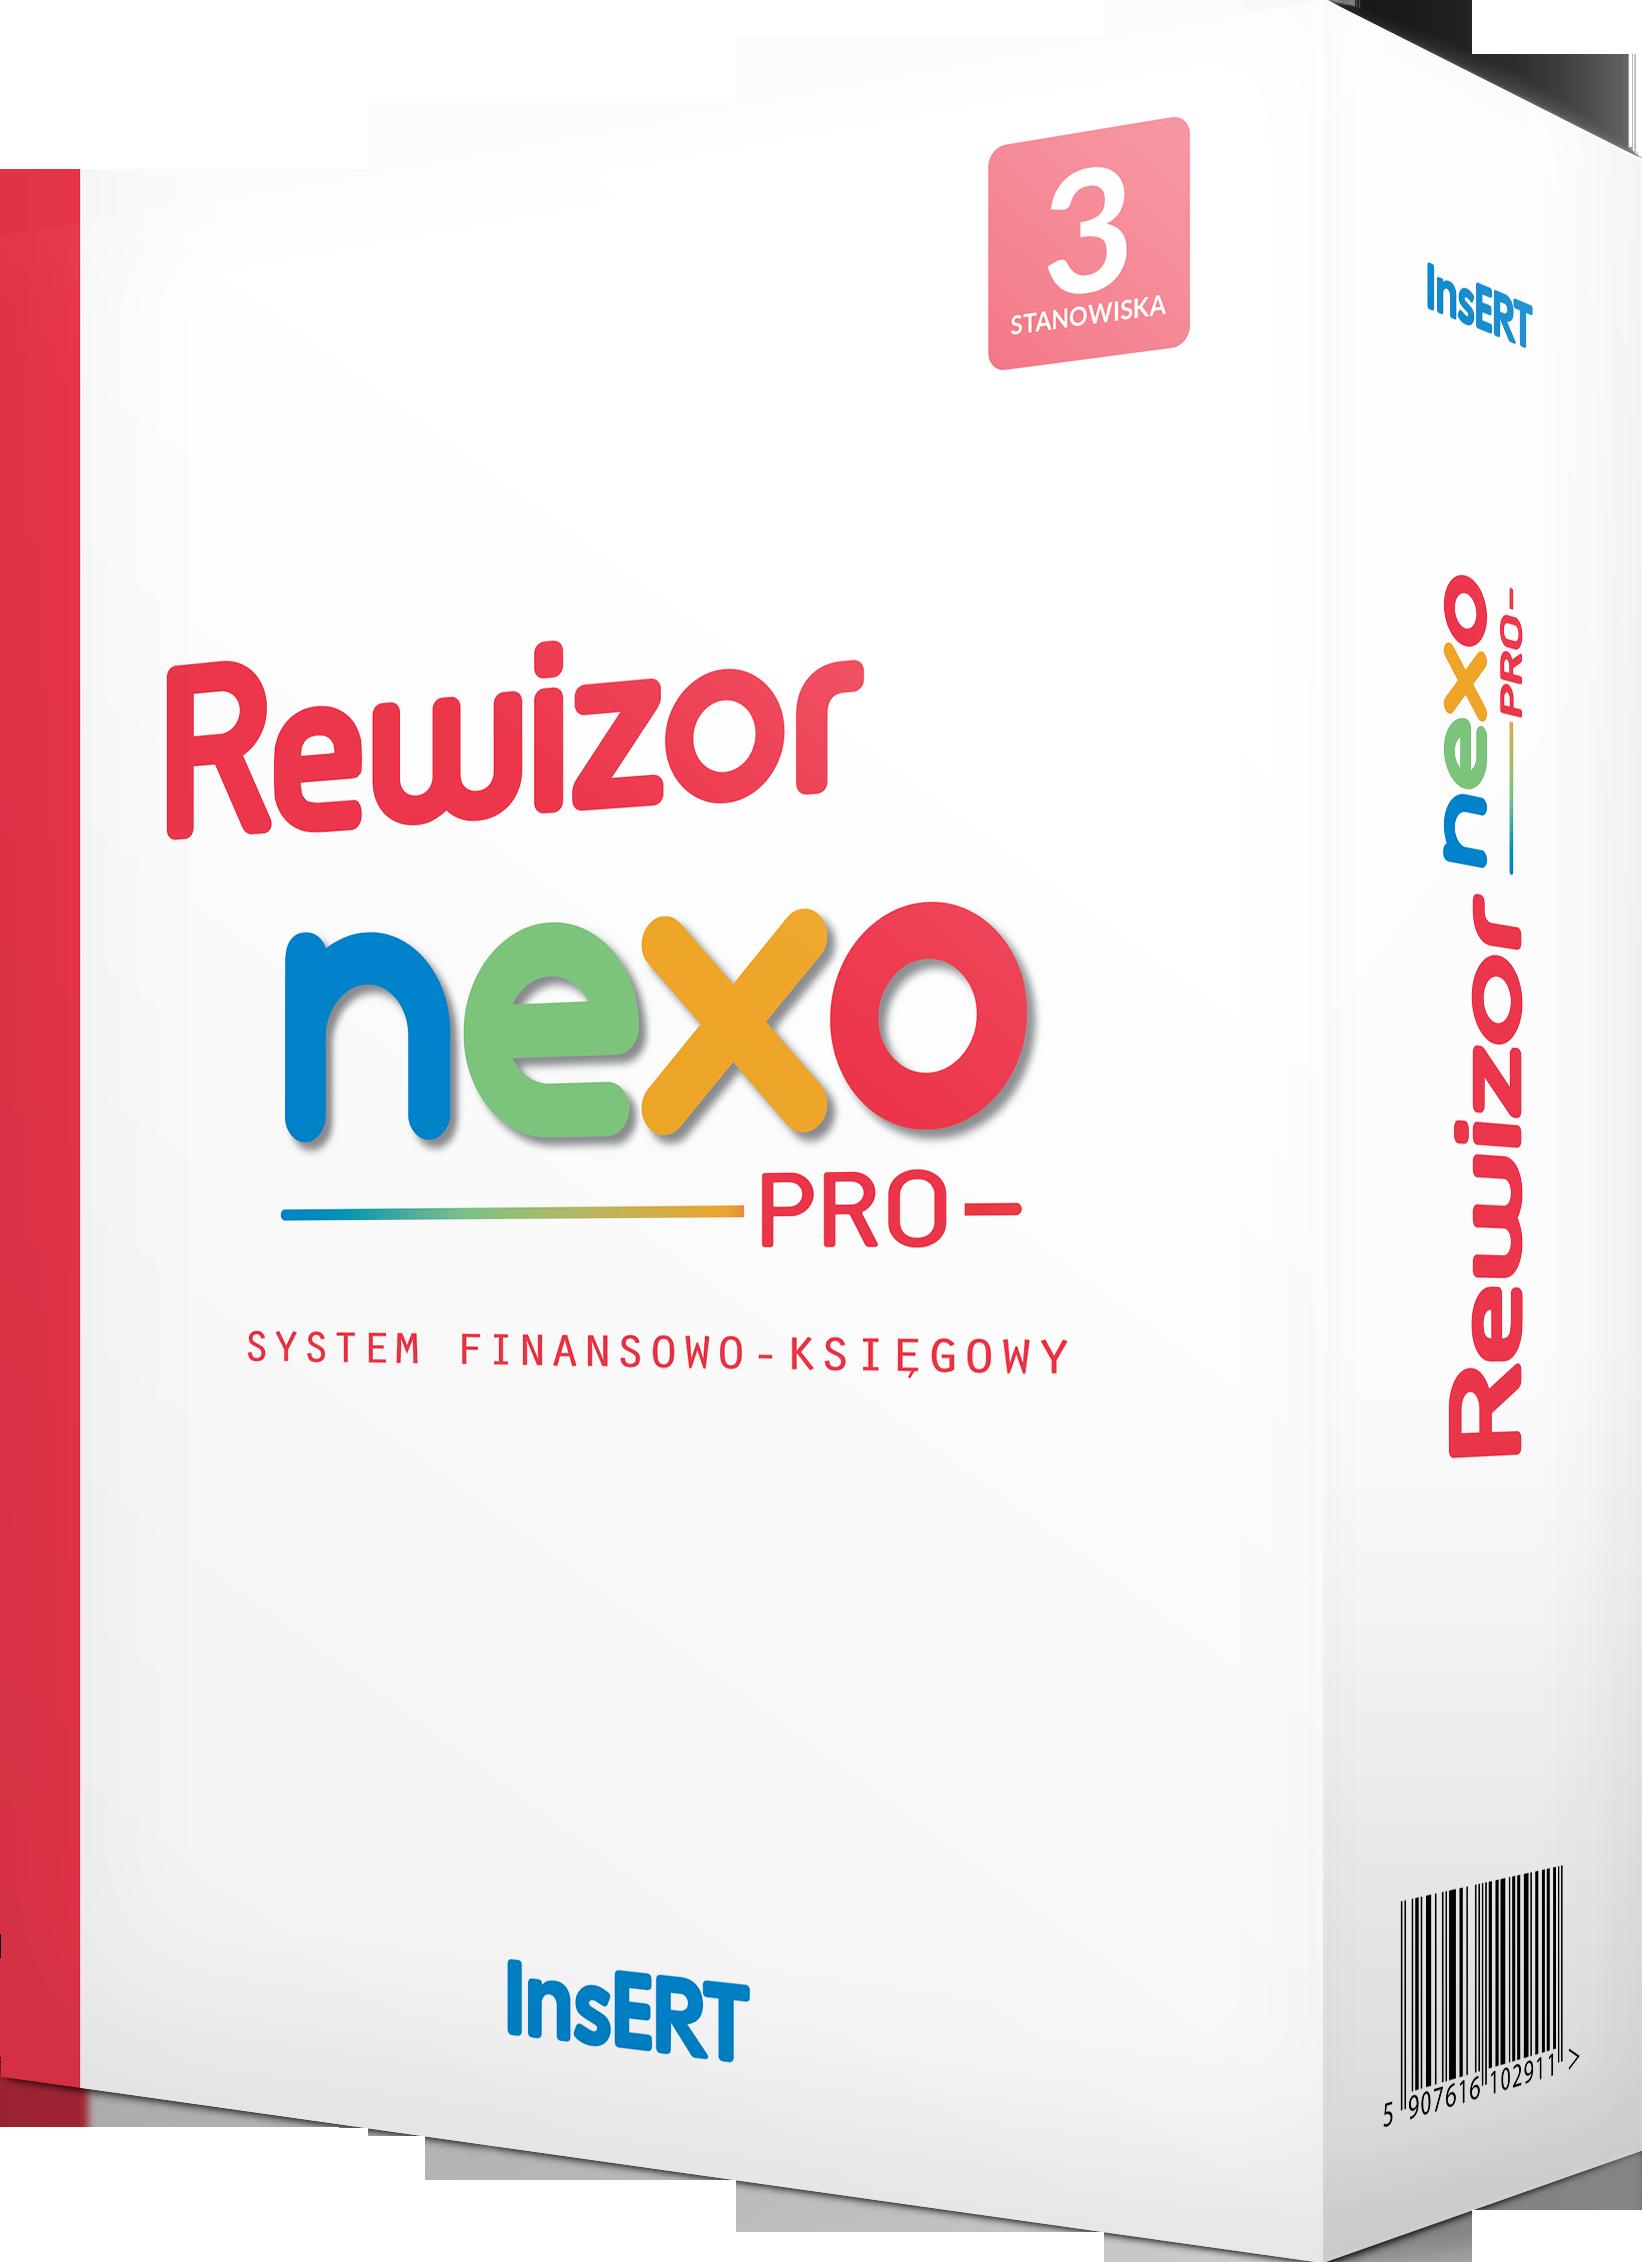 Rewizor nexo PRO 3